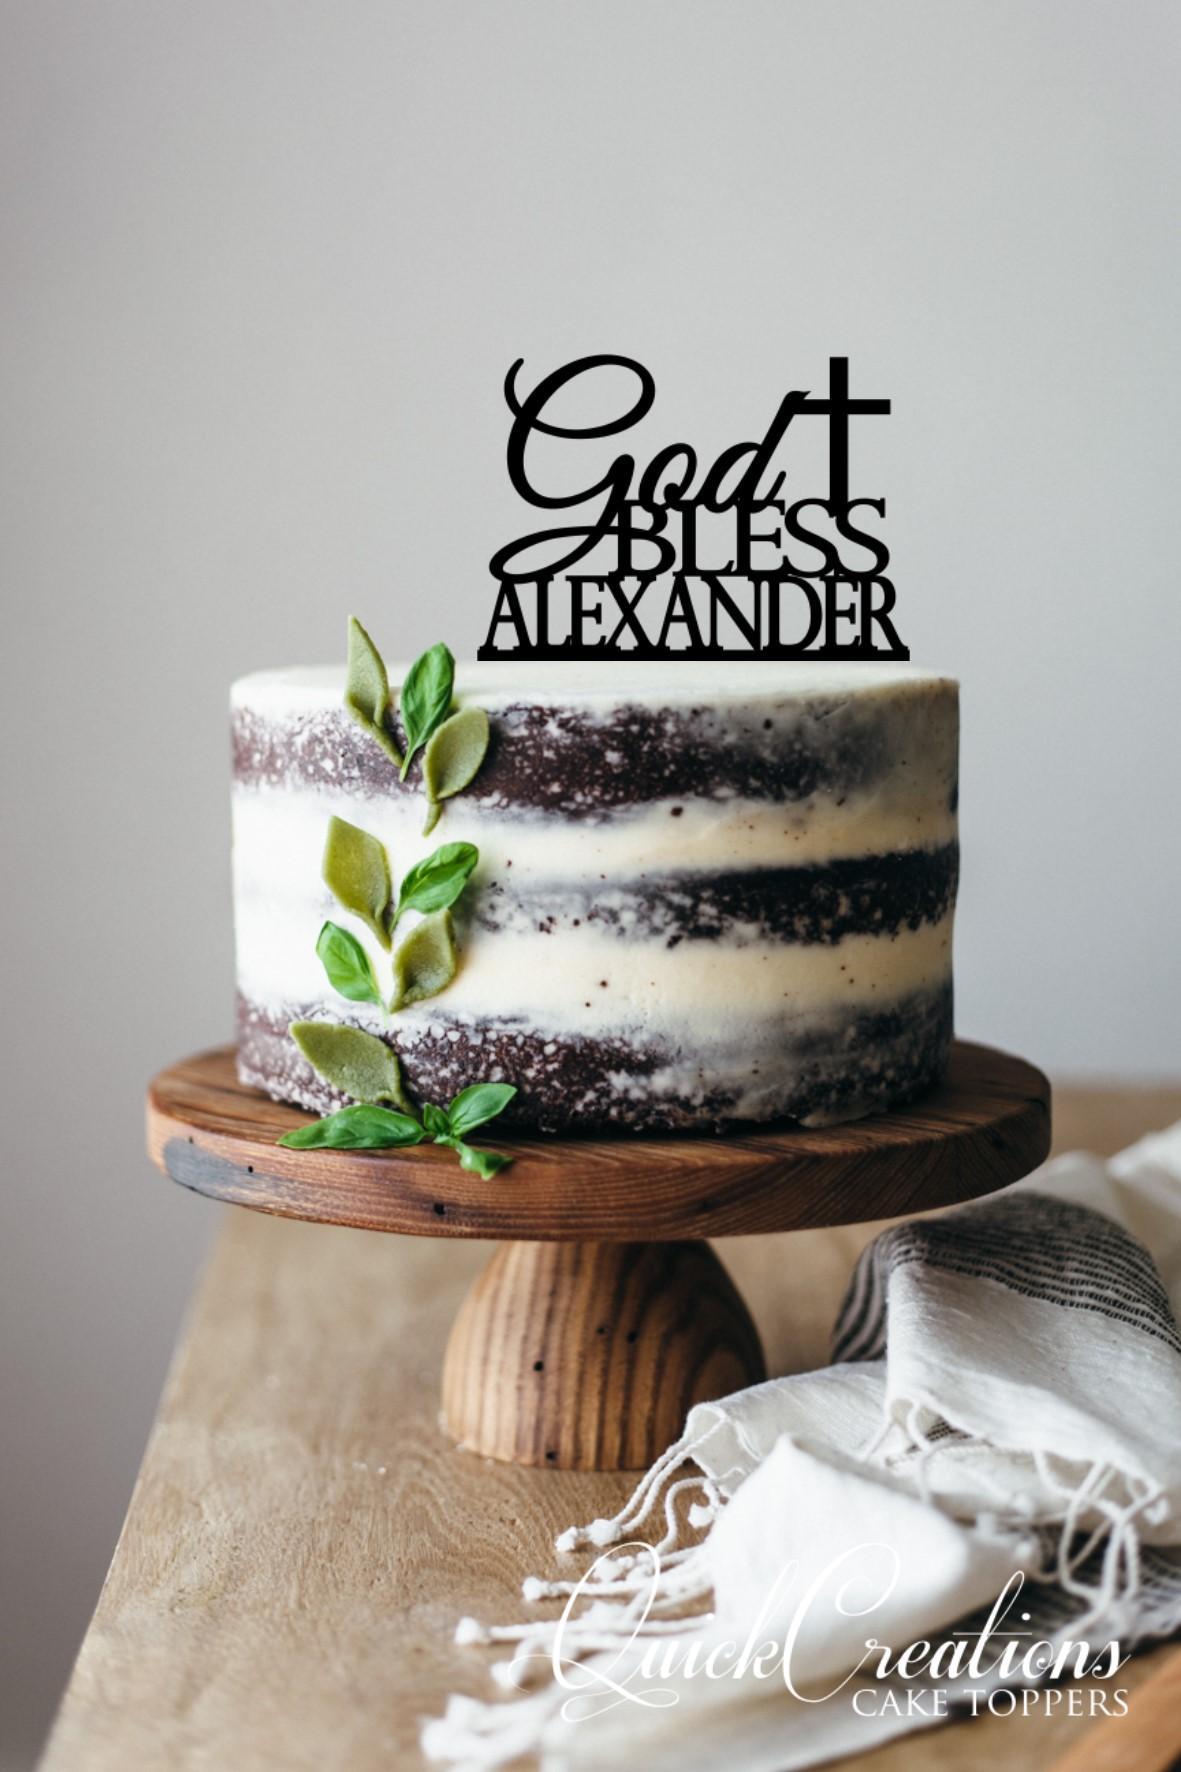 Quick Creations Cake Topper - God Bless Alexander Cross